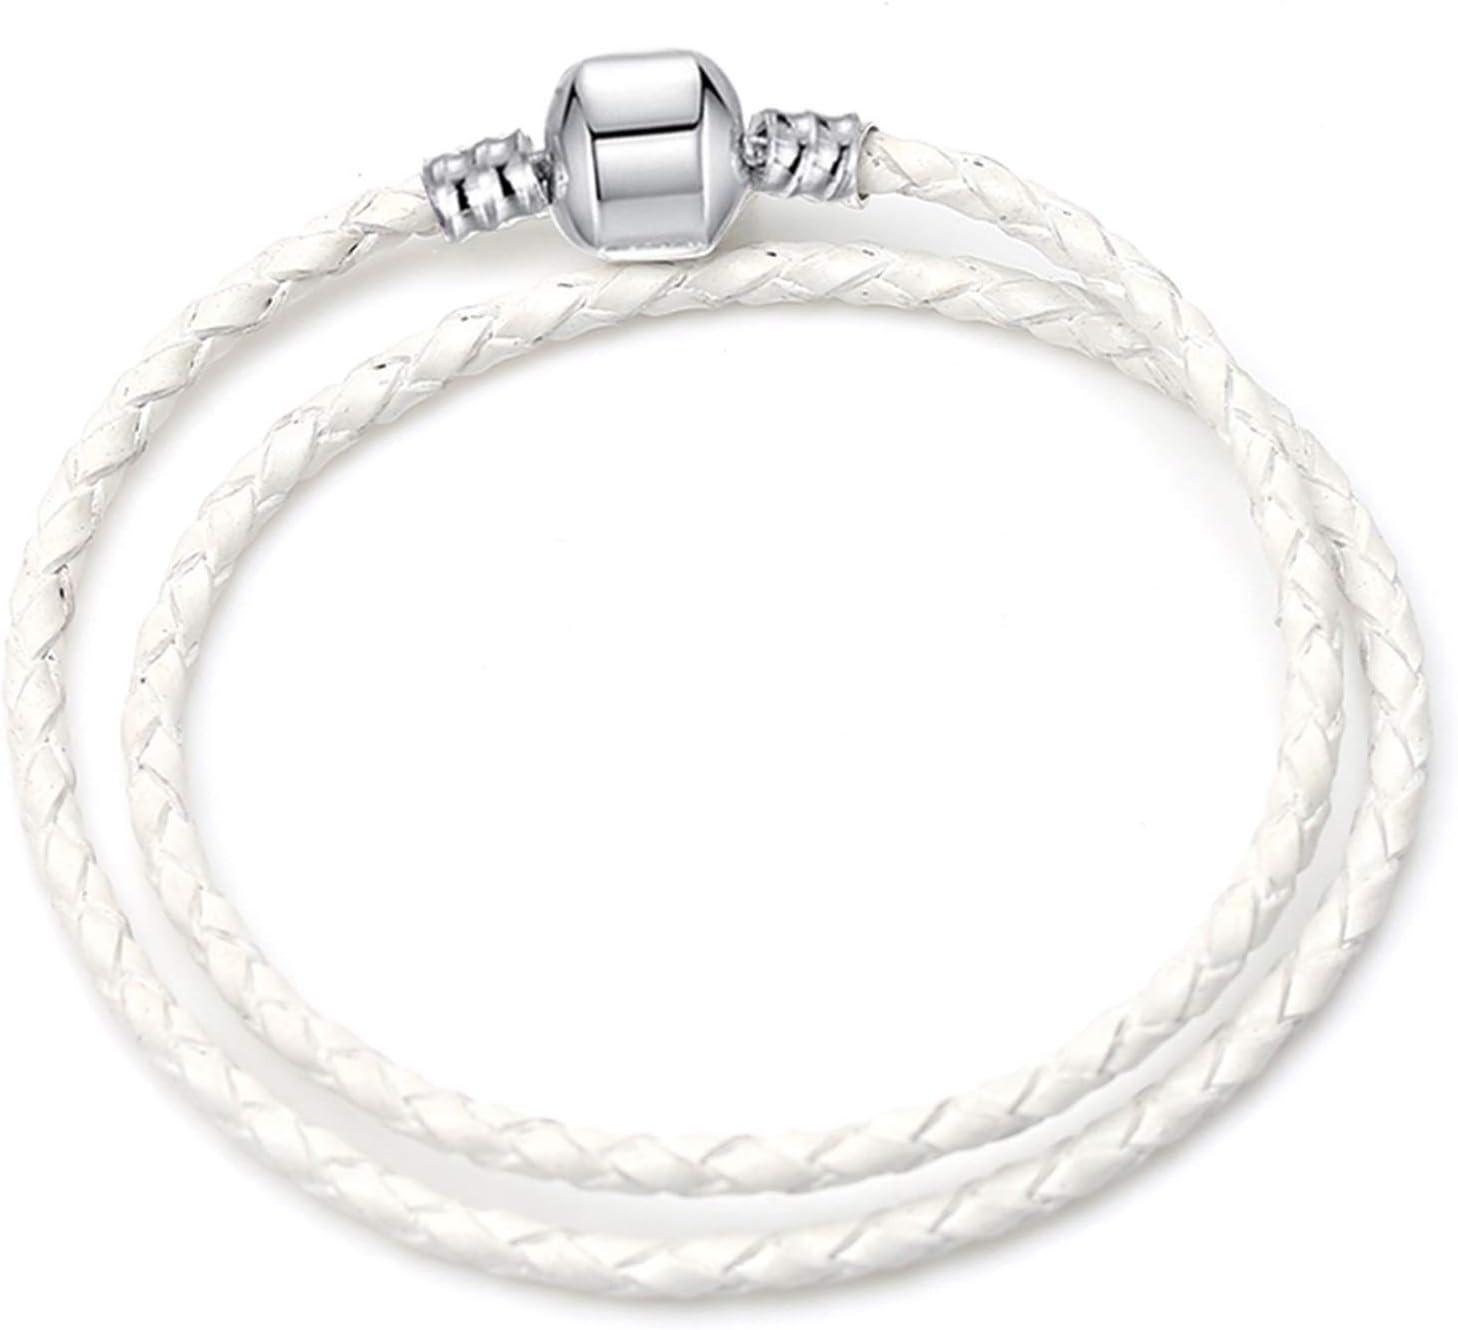 WANGJINQIAO Charm Bracelet Cheap Cute Mouse Snake Special Campaign Bra Basic fine Chain